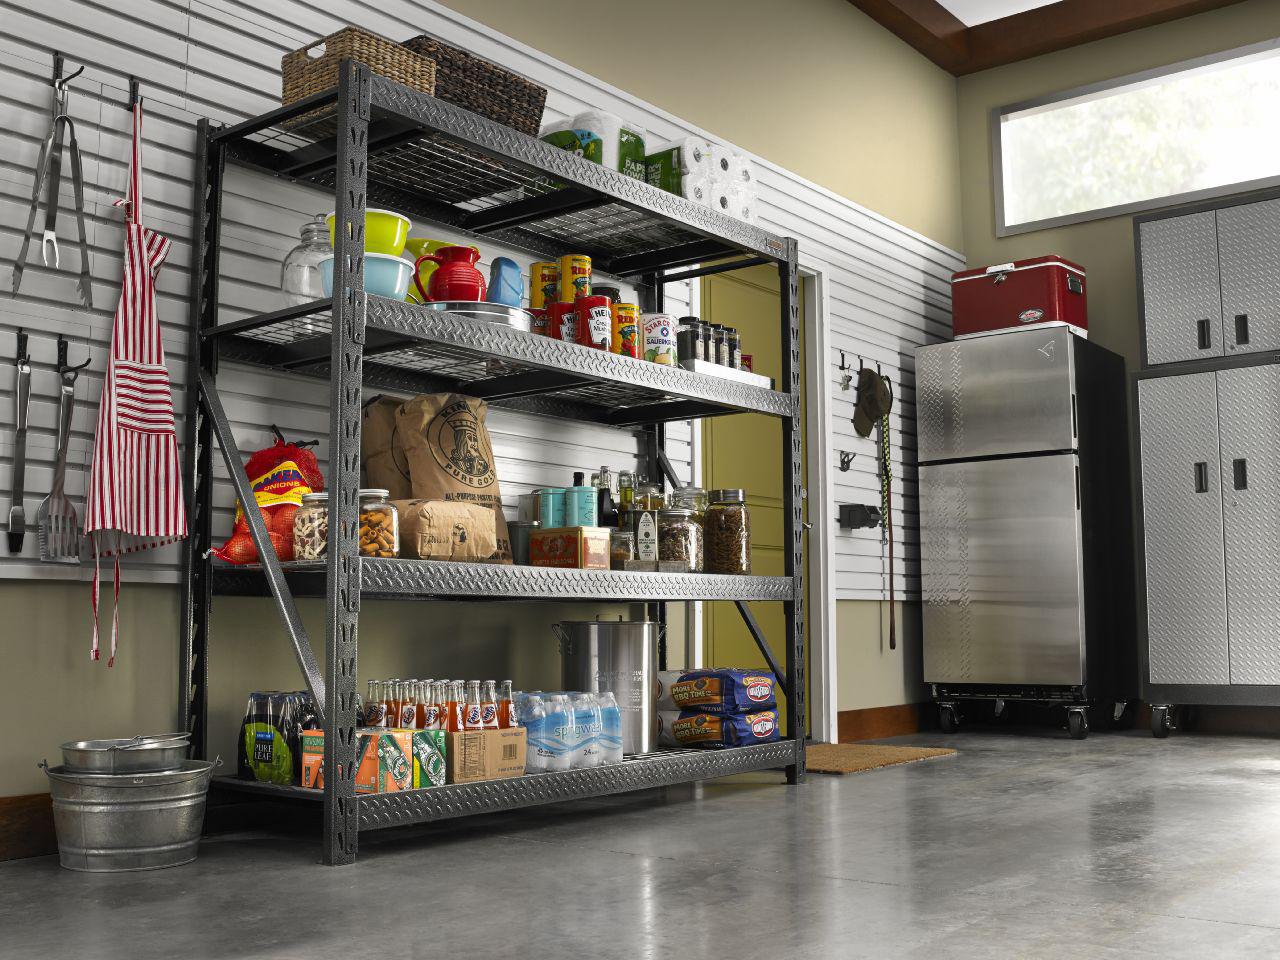 Gladiator 77 in. W x 24 in. D x 73 in. H 4-Shelf Welded Steel Garage Shelving Unit, 8000 lb. Capacity